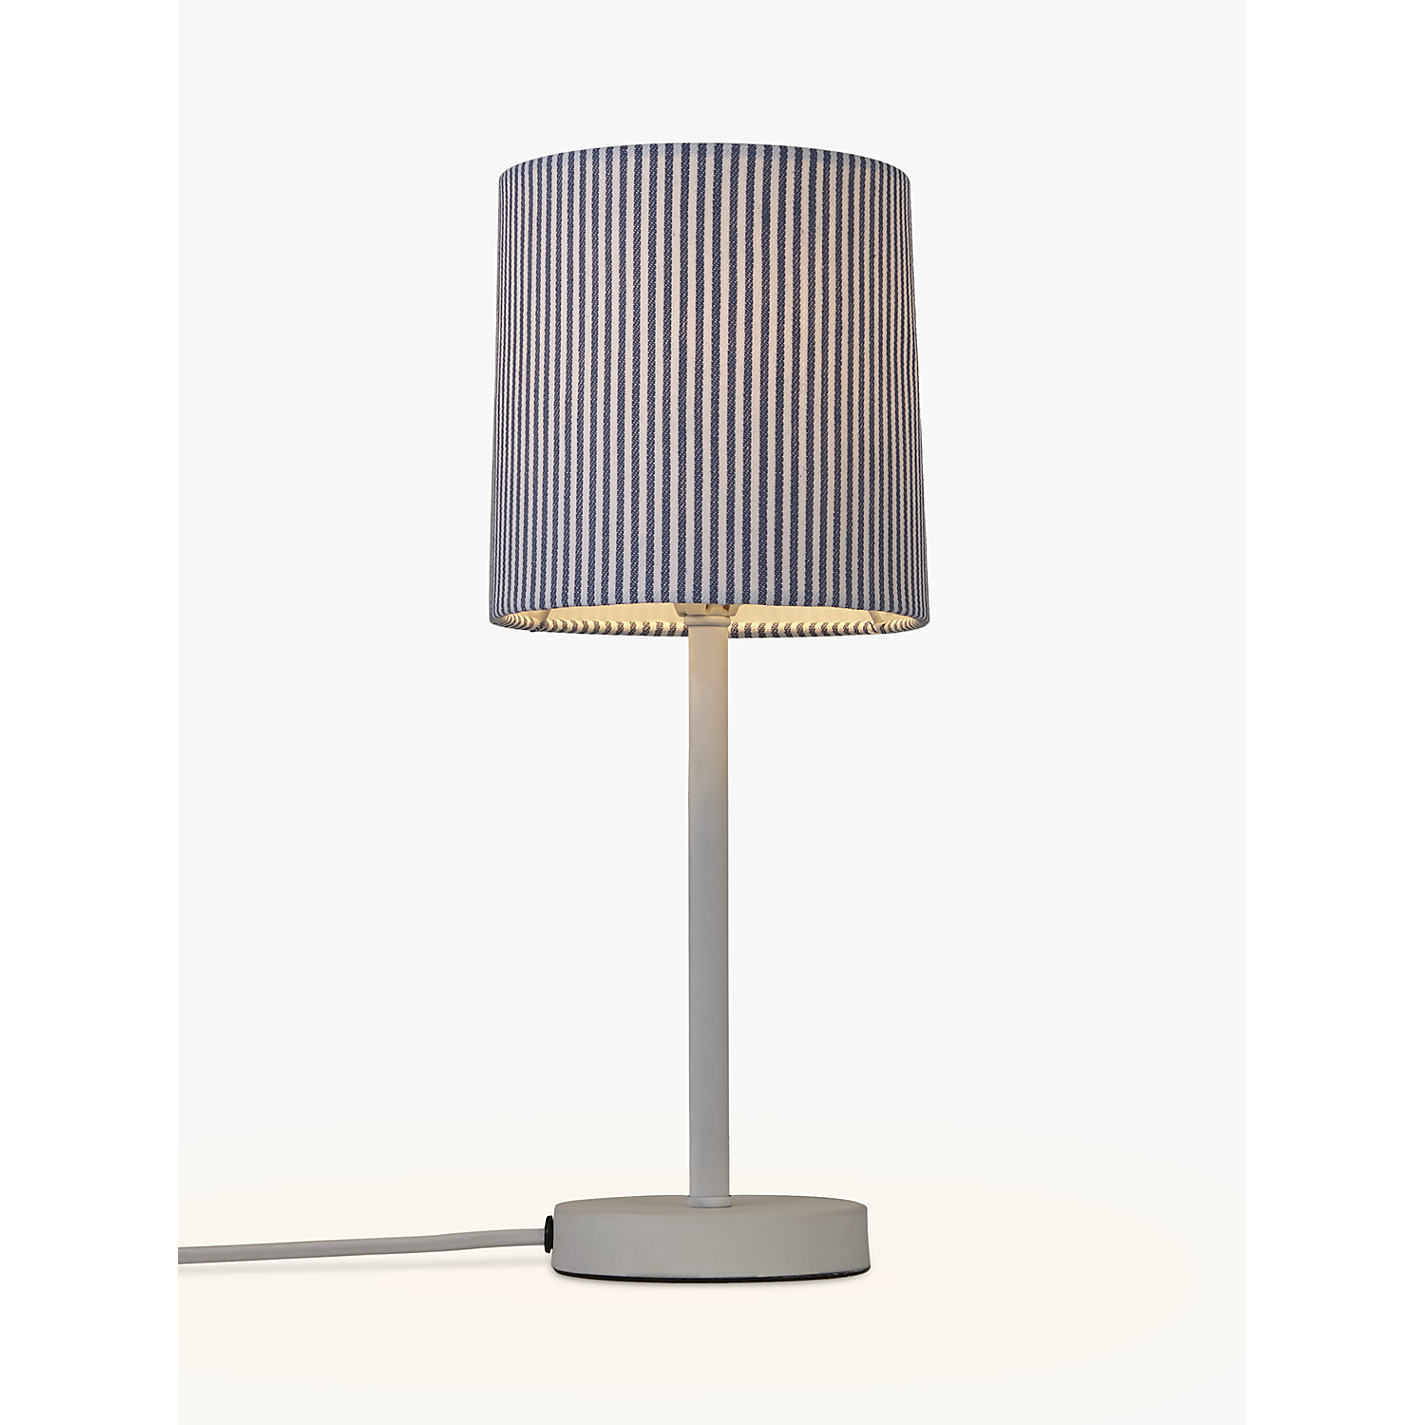 Buy john lewis eastbourne stick table lamp white john lewis buy john lewis eastbourne stick table lamp white online at johnlewis geotapseo Images